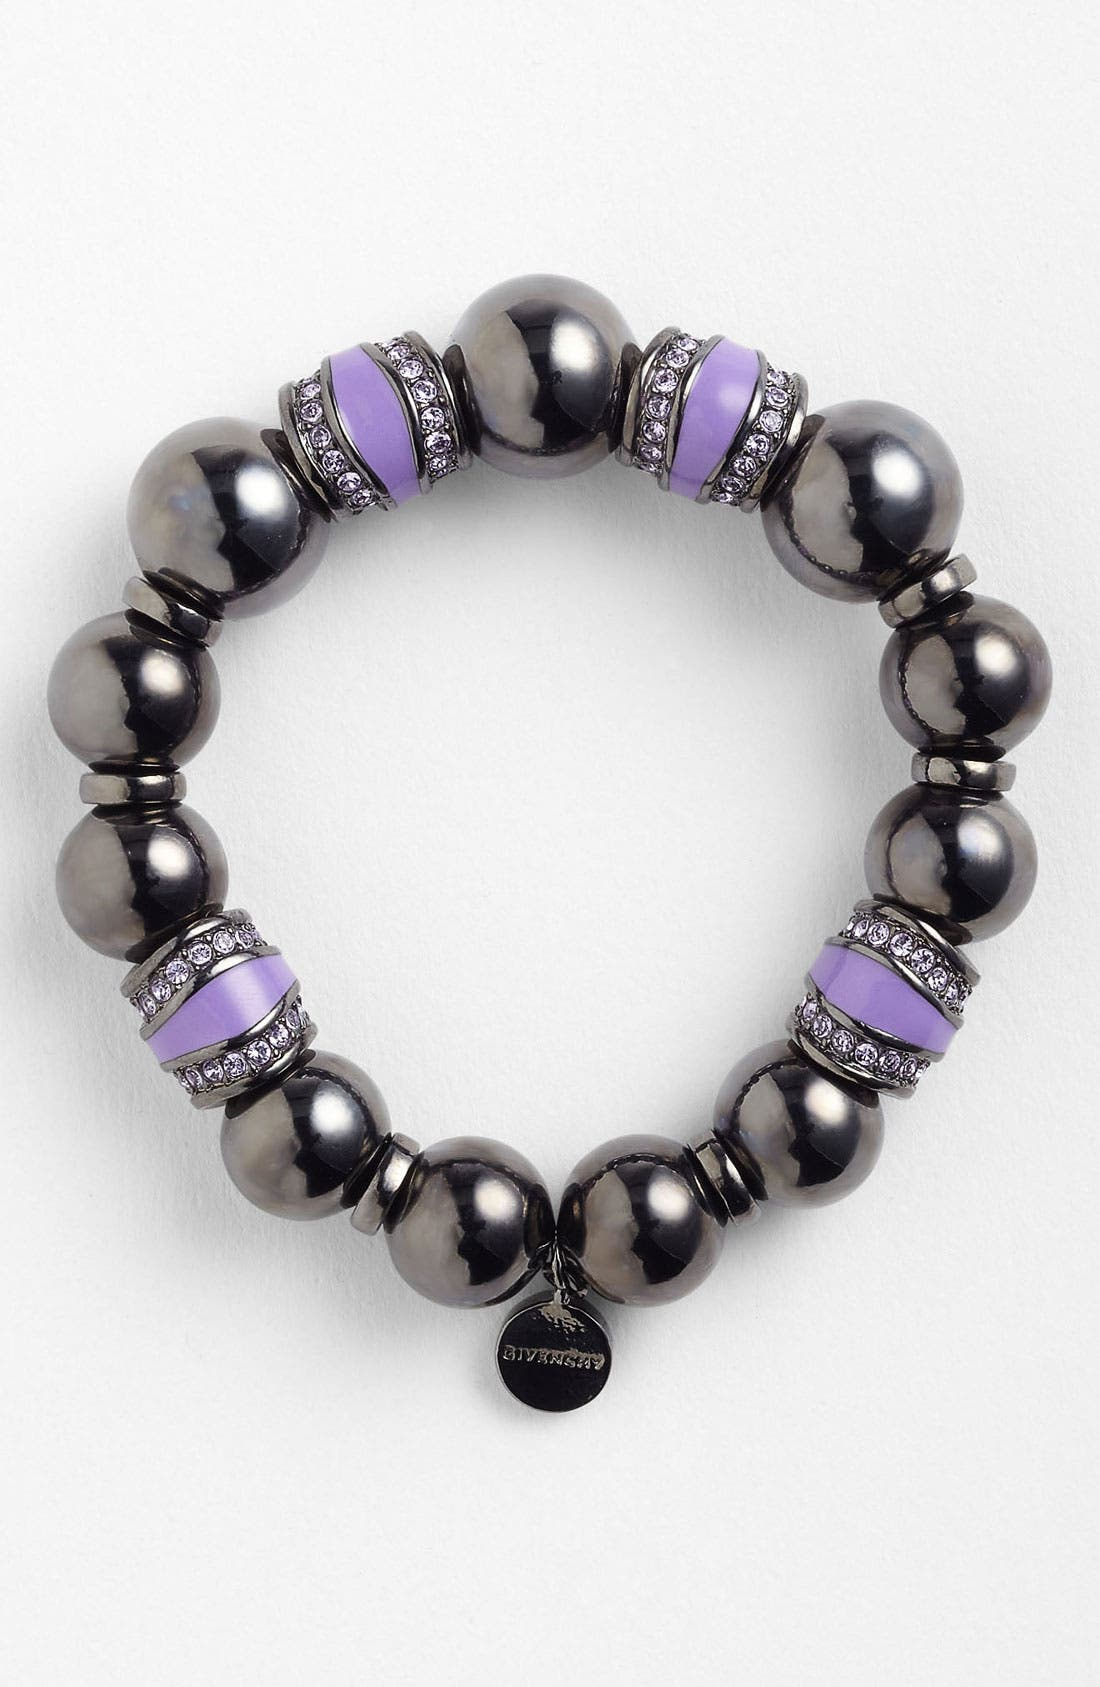 Alternate Image 1 Selected - Givenchy 'Harvest' Bead Stretch Bracelet